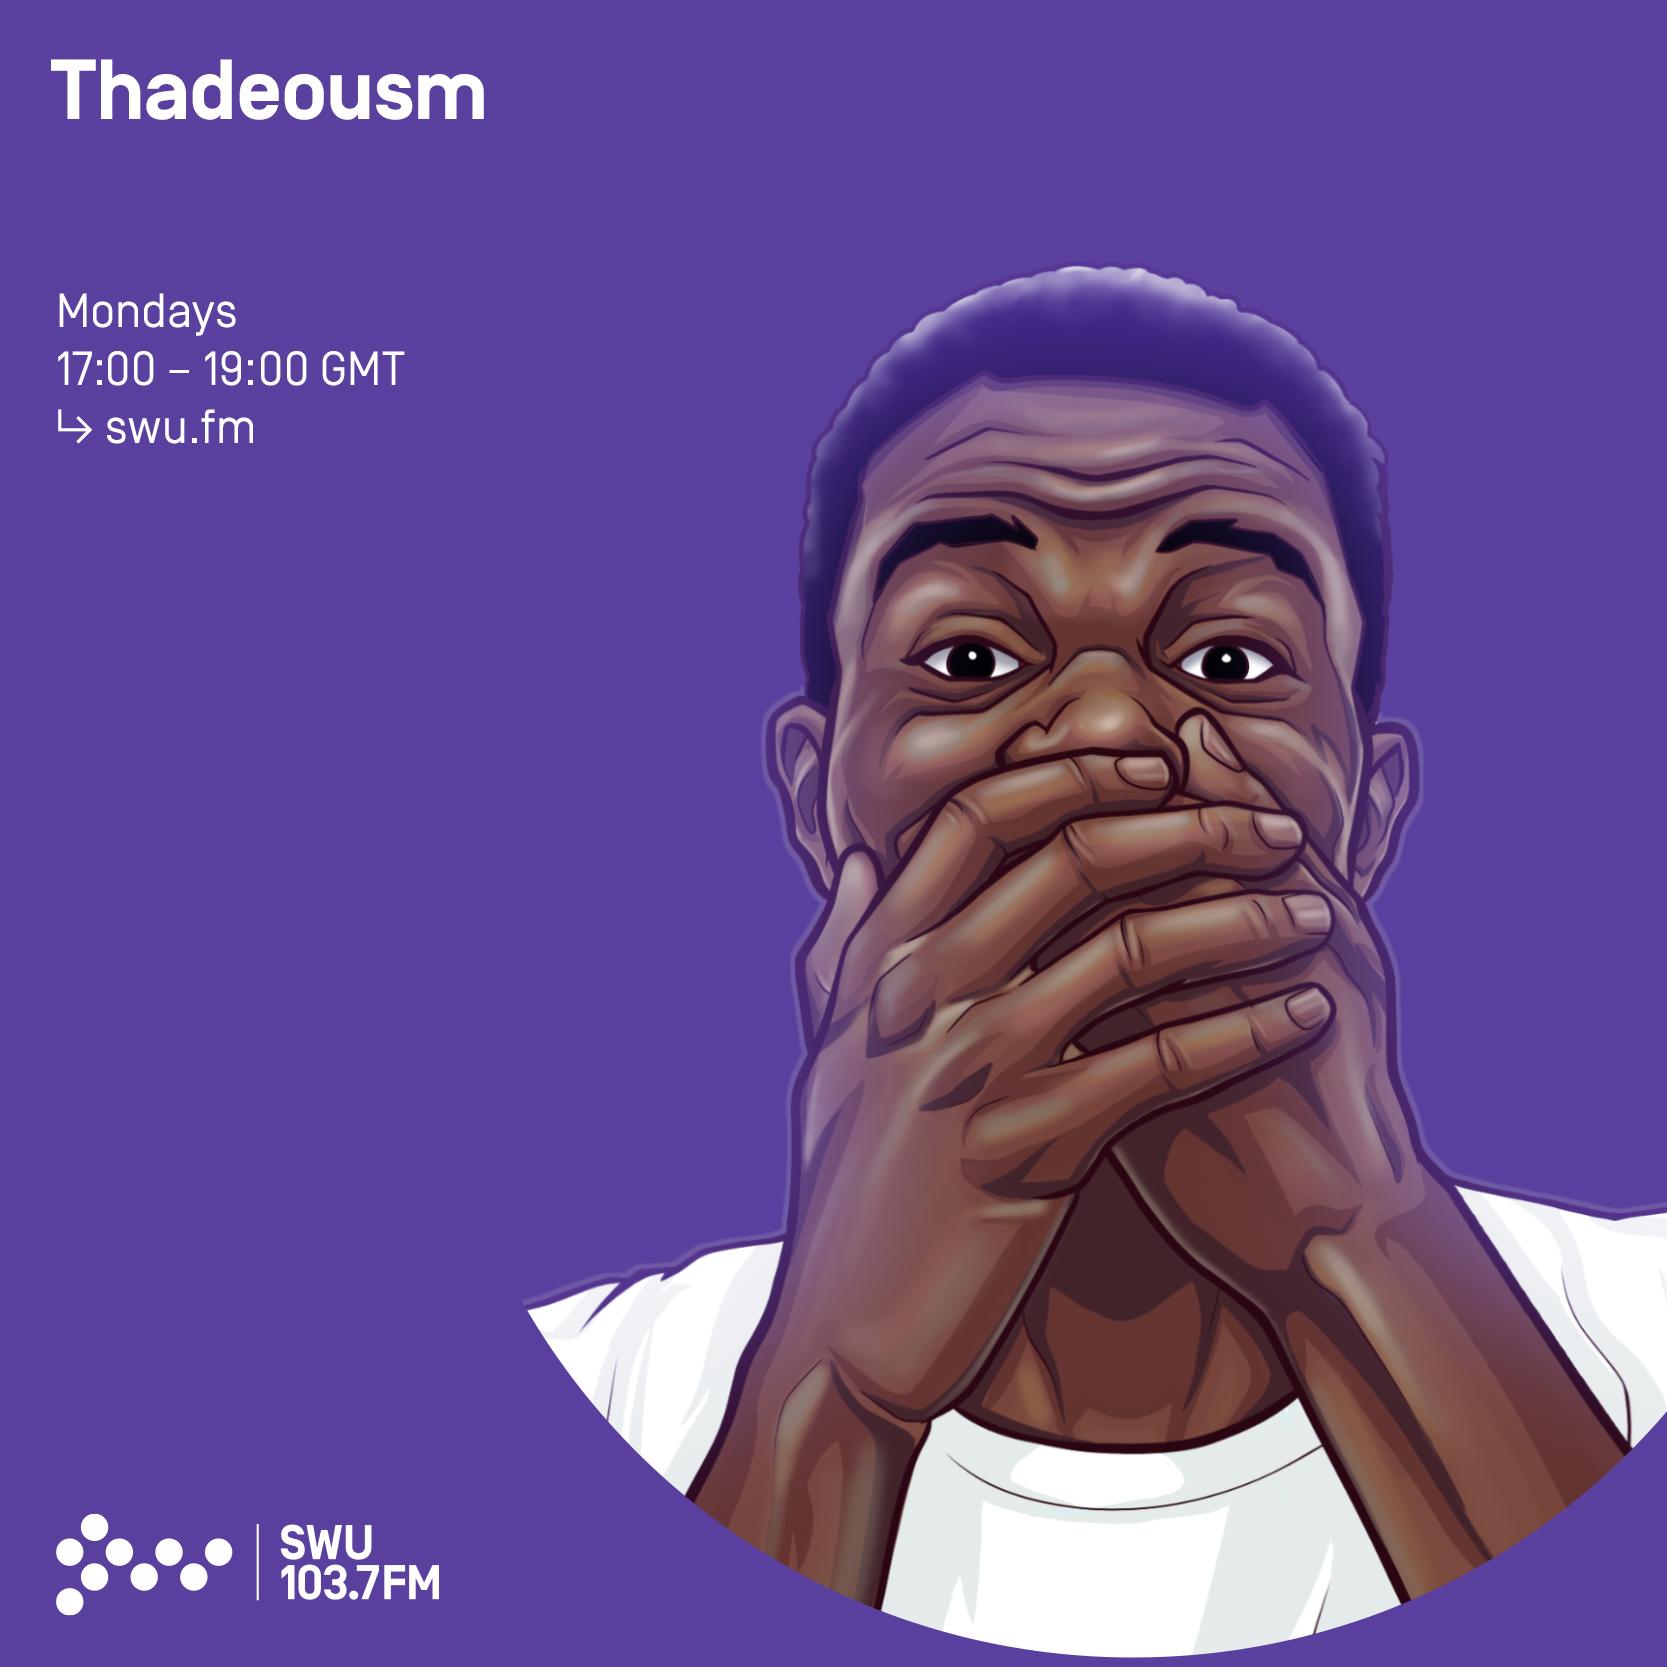 ThadeousM